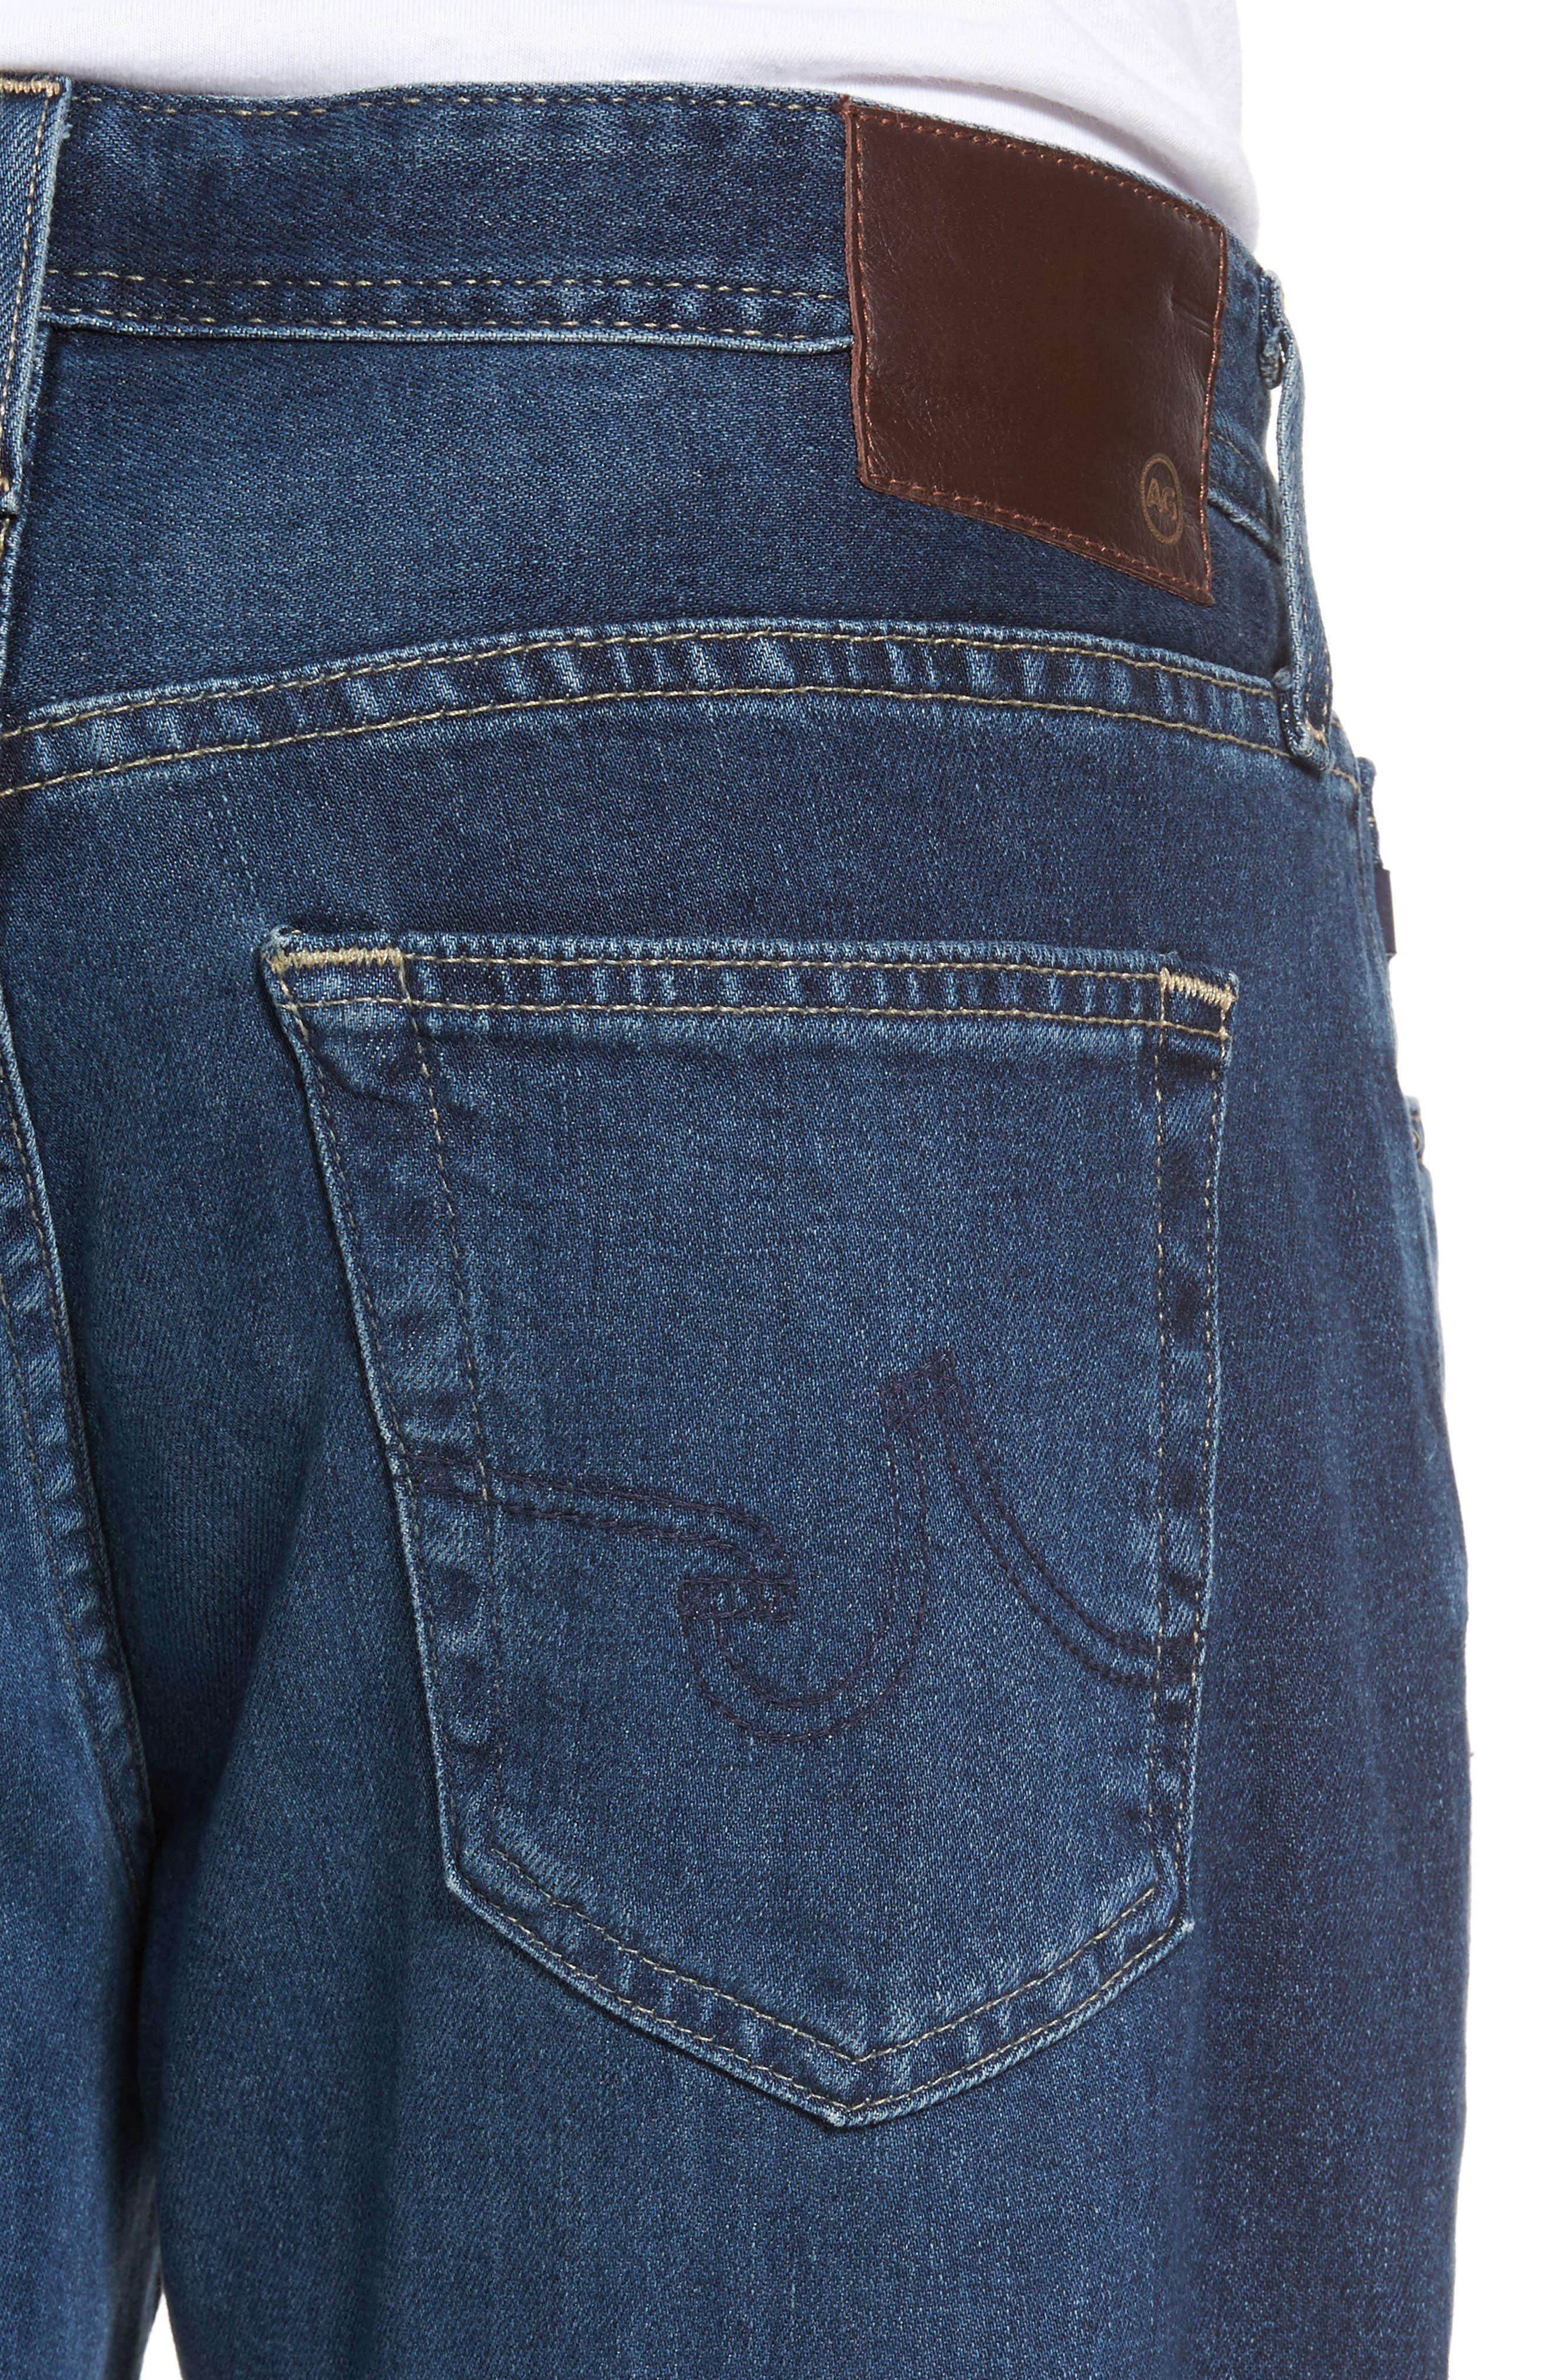 Graduate Slim Straight Leg Jeans,                             Alternate thumbnail 7, color,